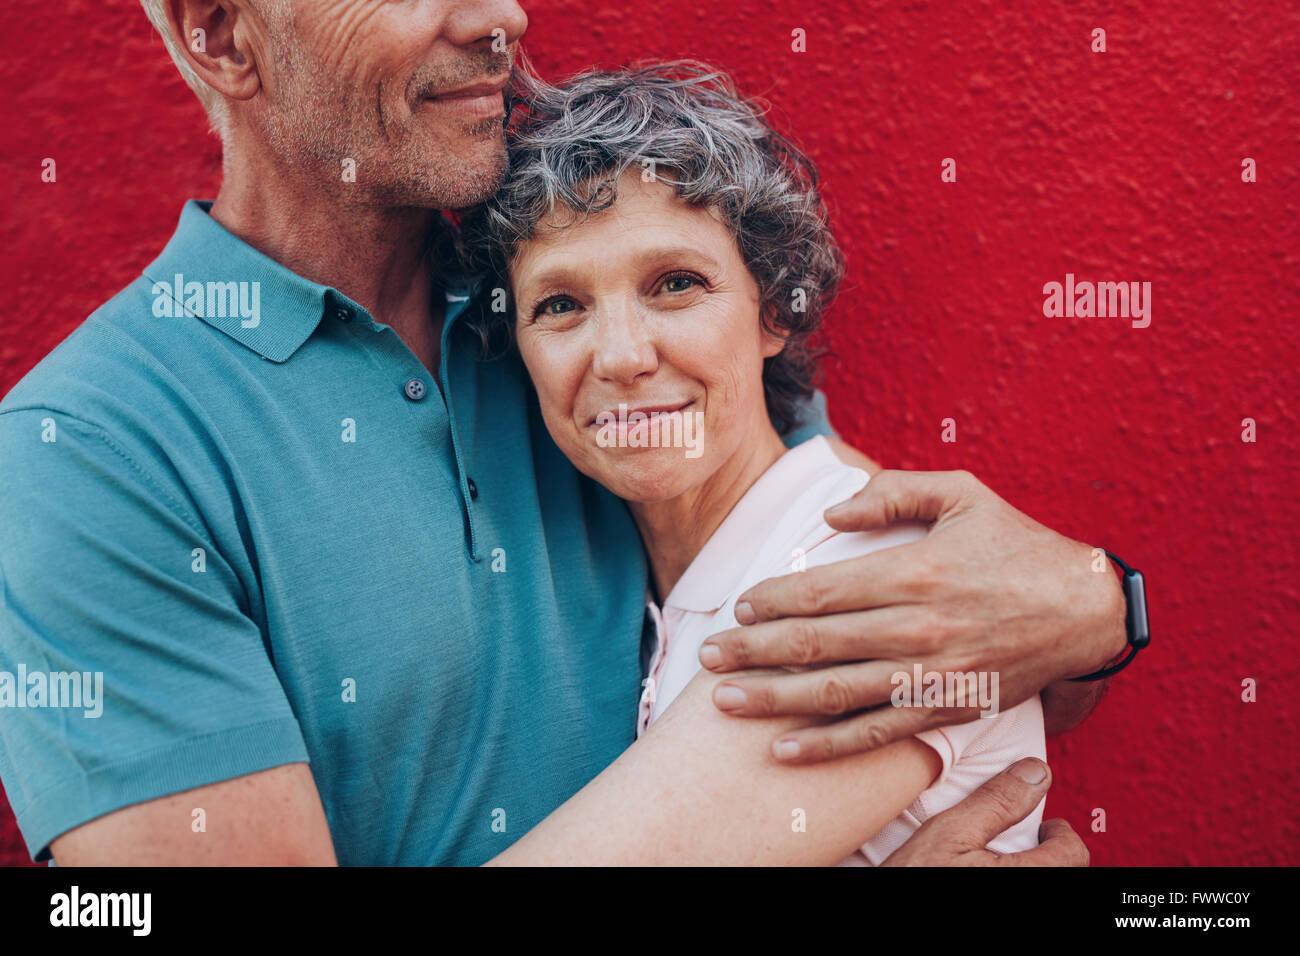 Portrait of happy young couple embracing son mari contre fond rouge. Affectionate couple ensemble contre fond rouge Photo Stock